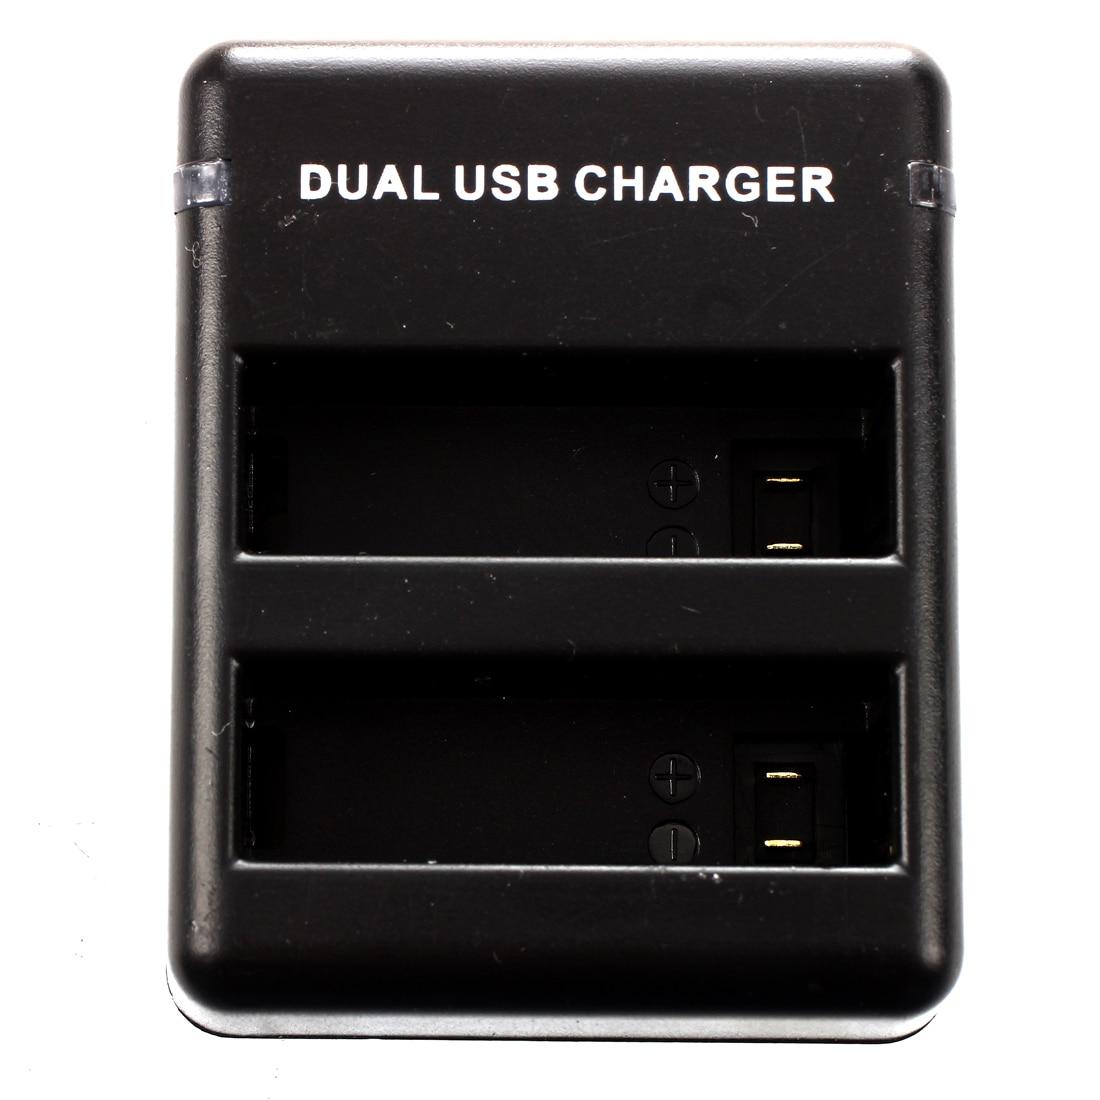 3 x AHDBT-401 литий-ионный Батарея + Dual USB Зарядное устройство для <font><b>GoPro</b></font> <font><b>Hero</b></font> <font><b>4</b></font> Камера-черный